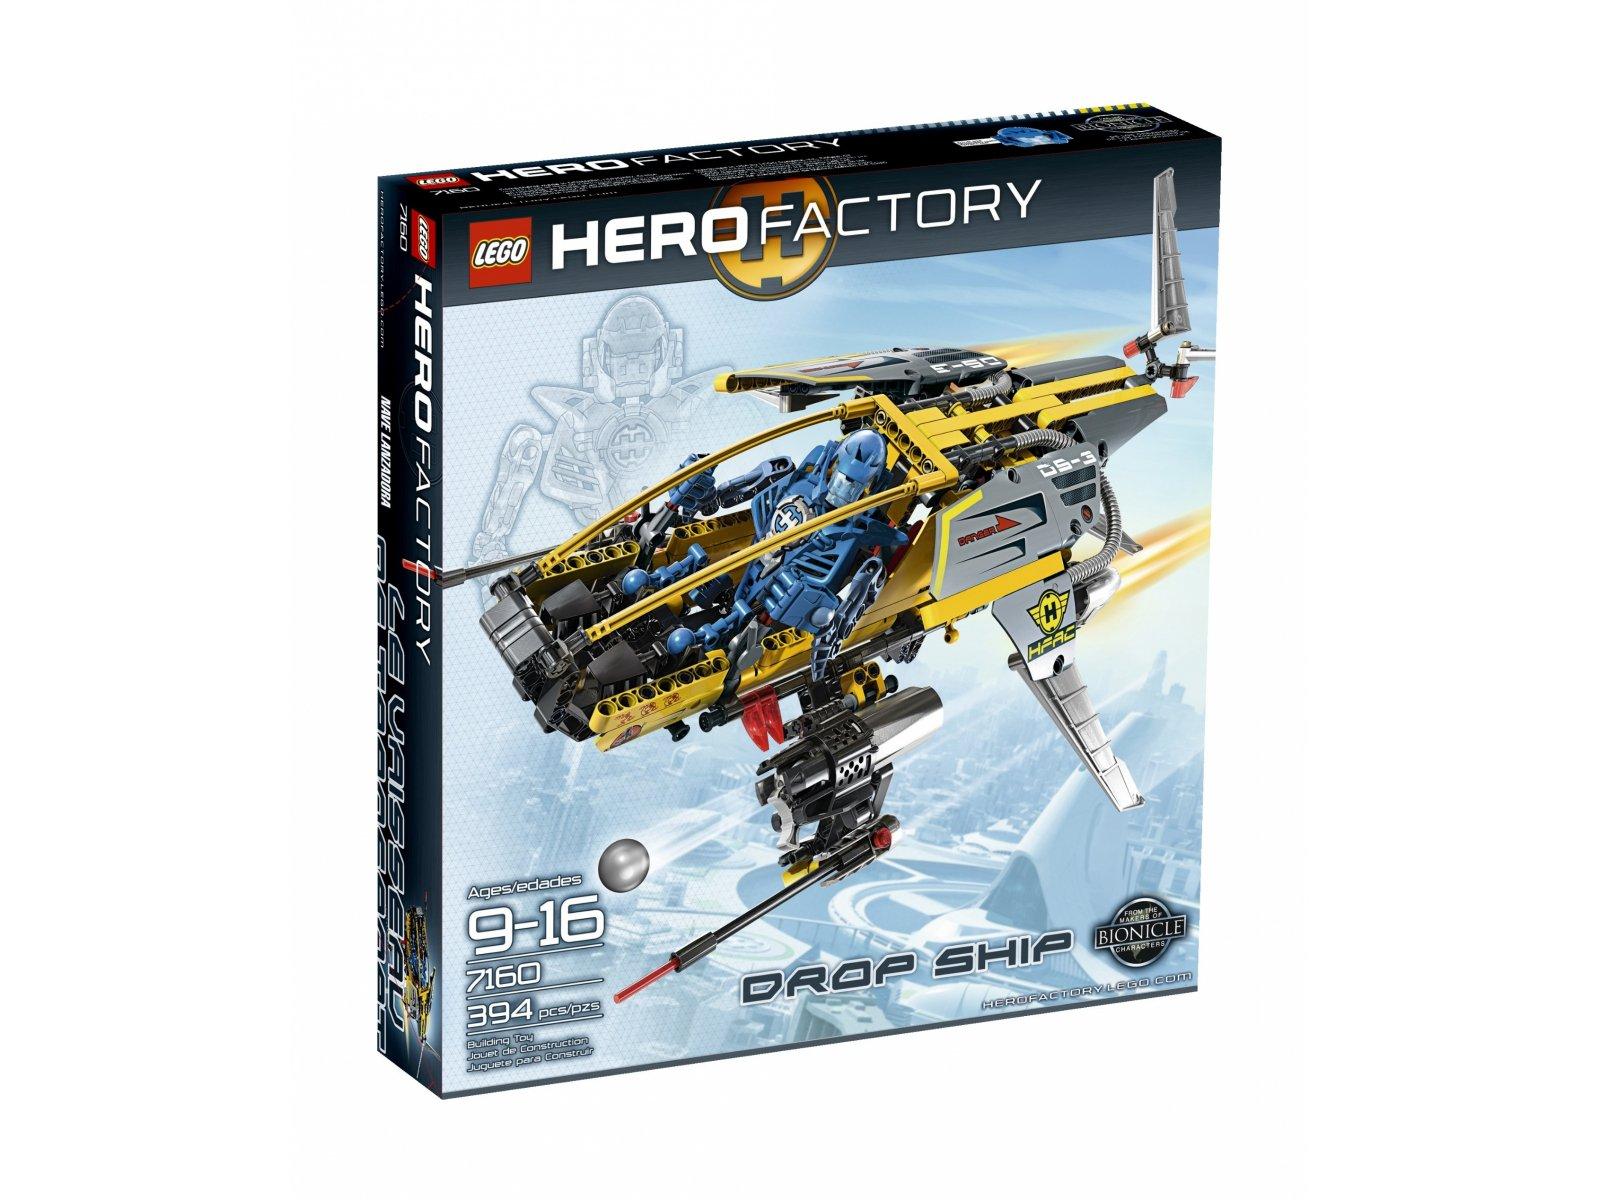 LEGO Hero Factory Drop Ship 7160